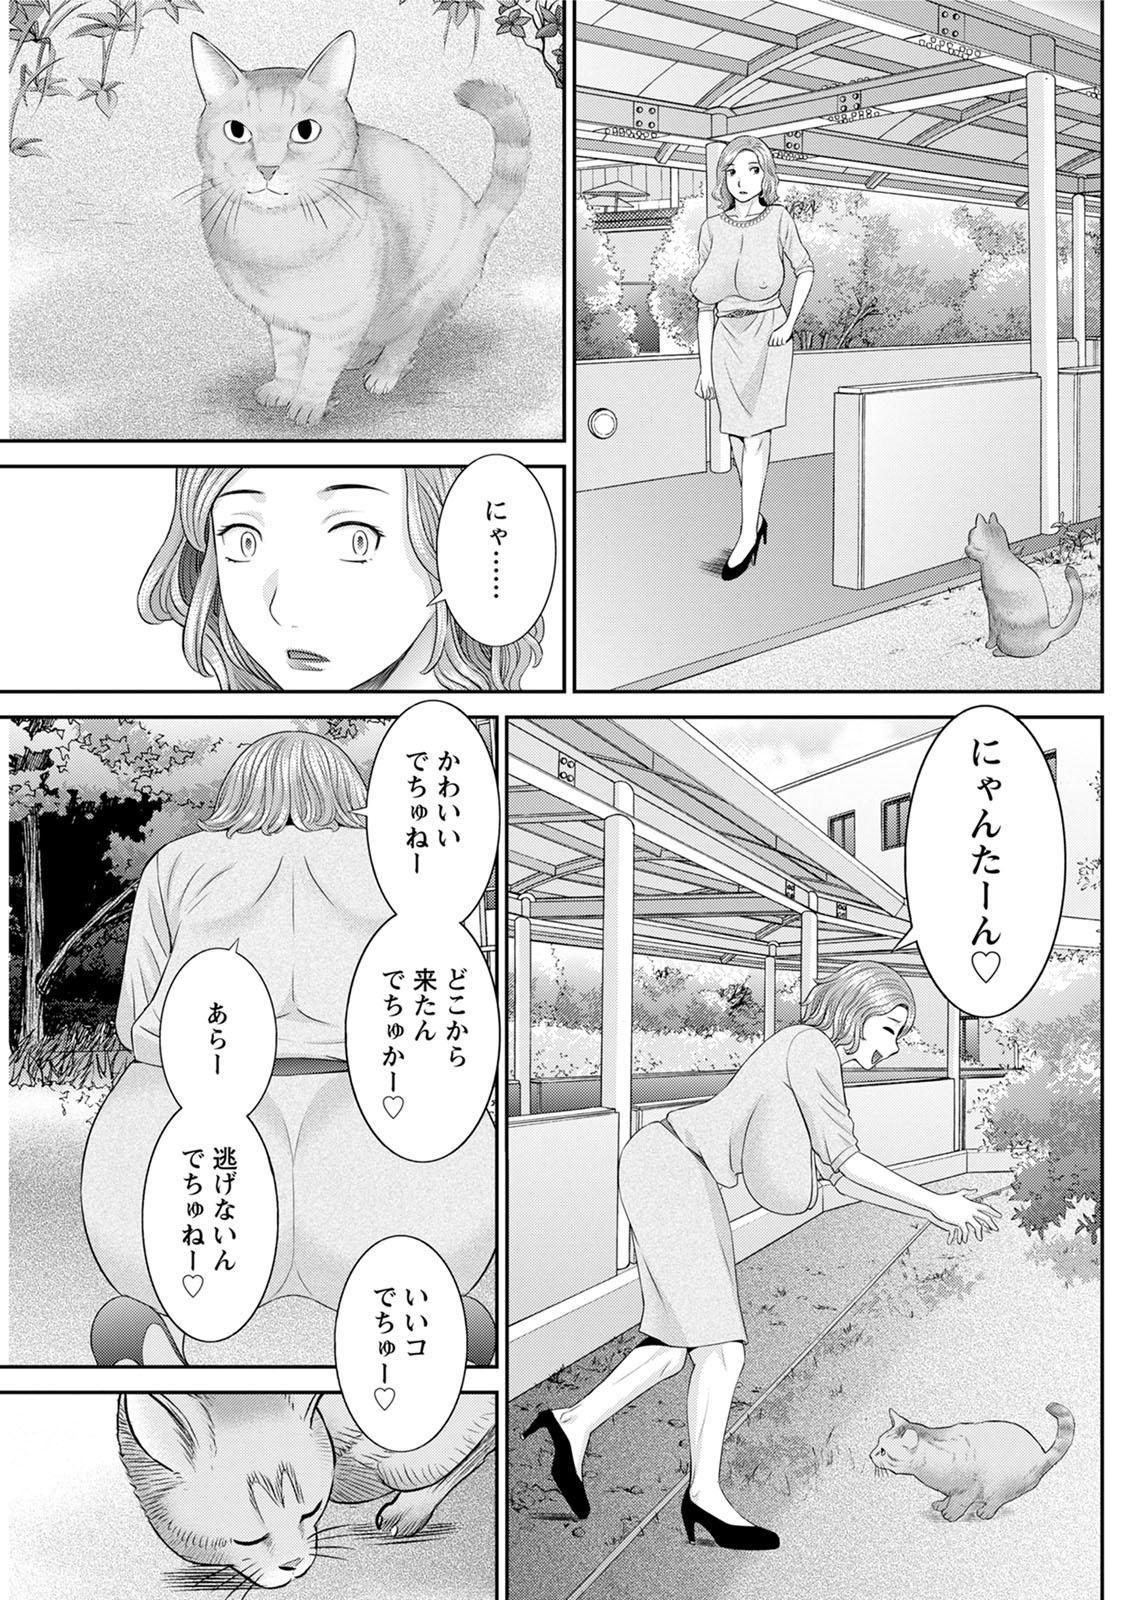 [Kawamori Misaki] Kaikan Hitotsuma Gakuen Ch. 1-6, 8-16 [Digital] 223